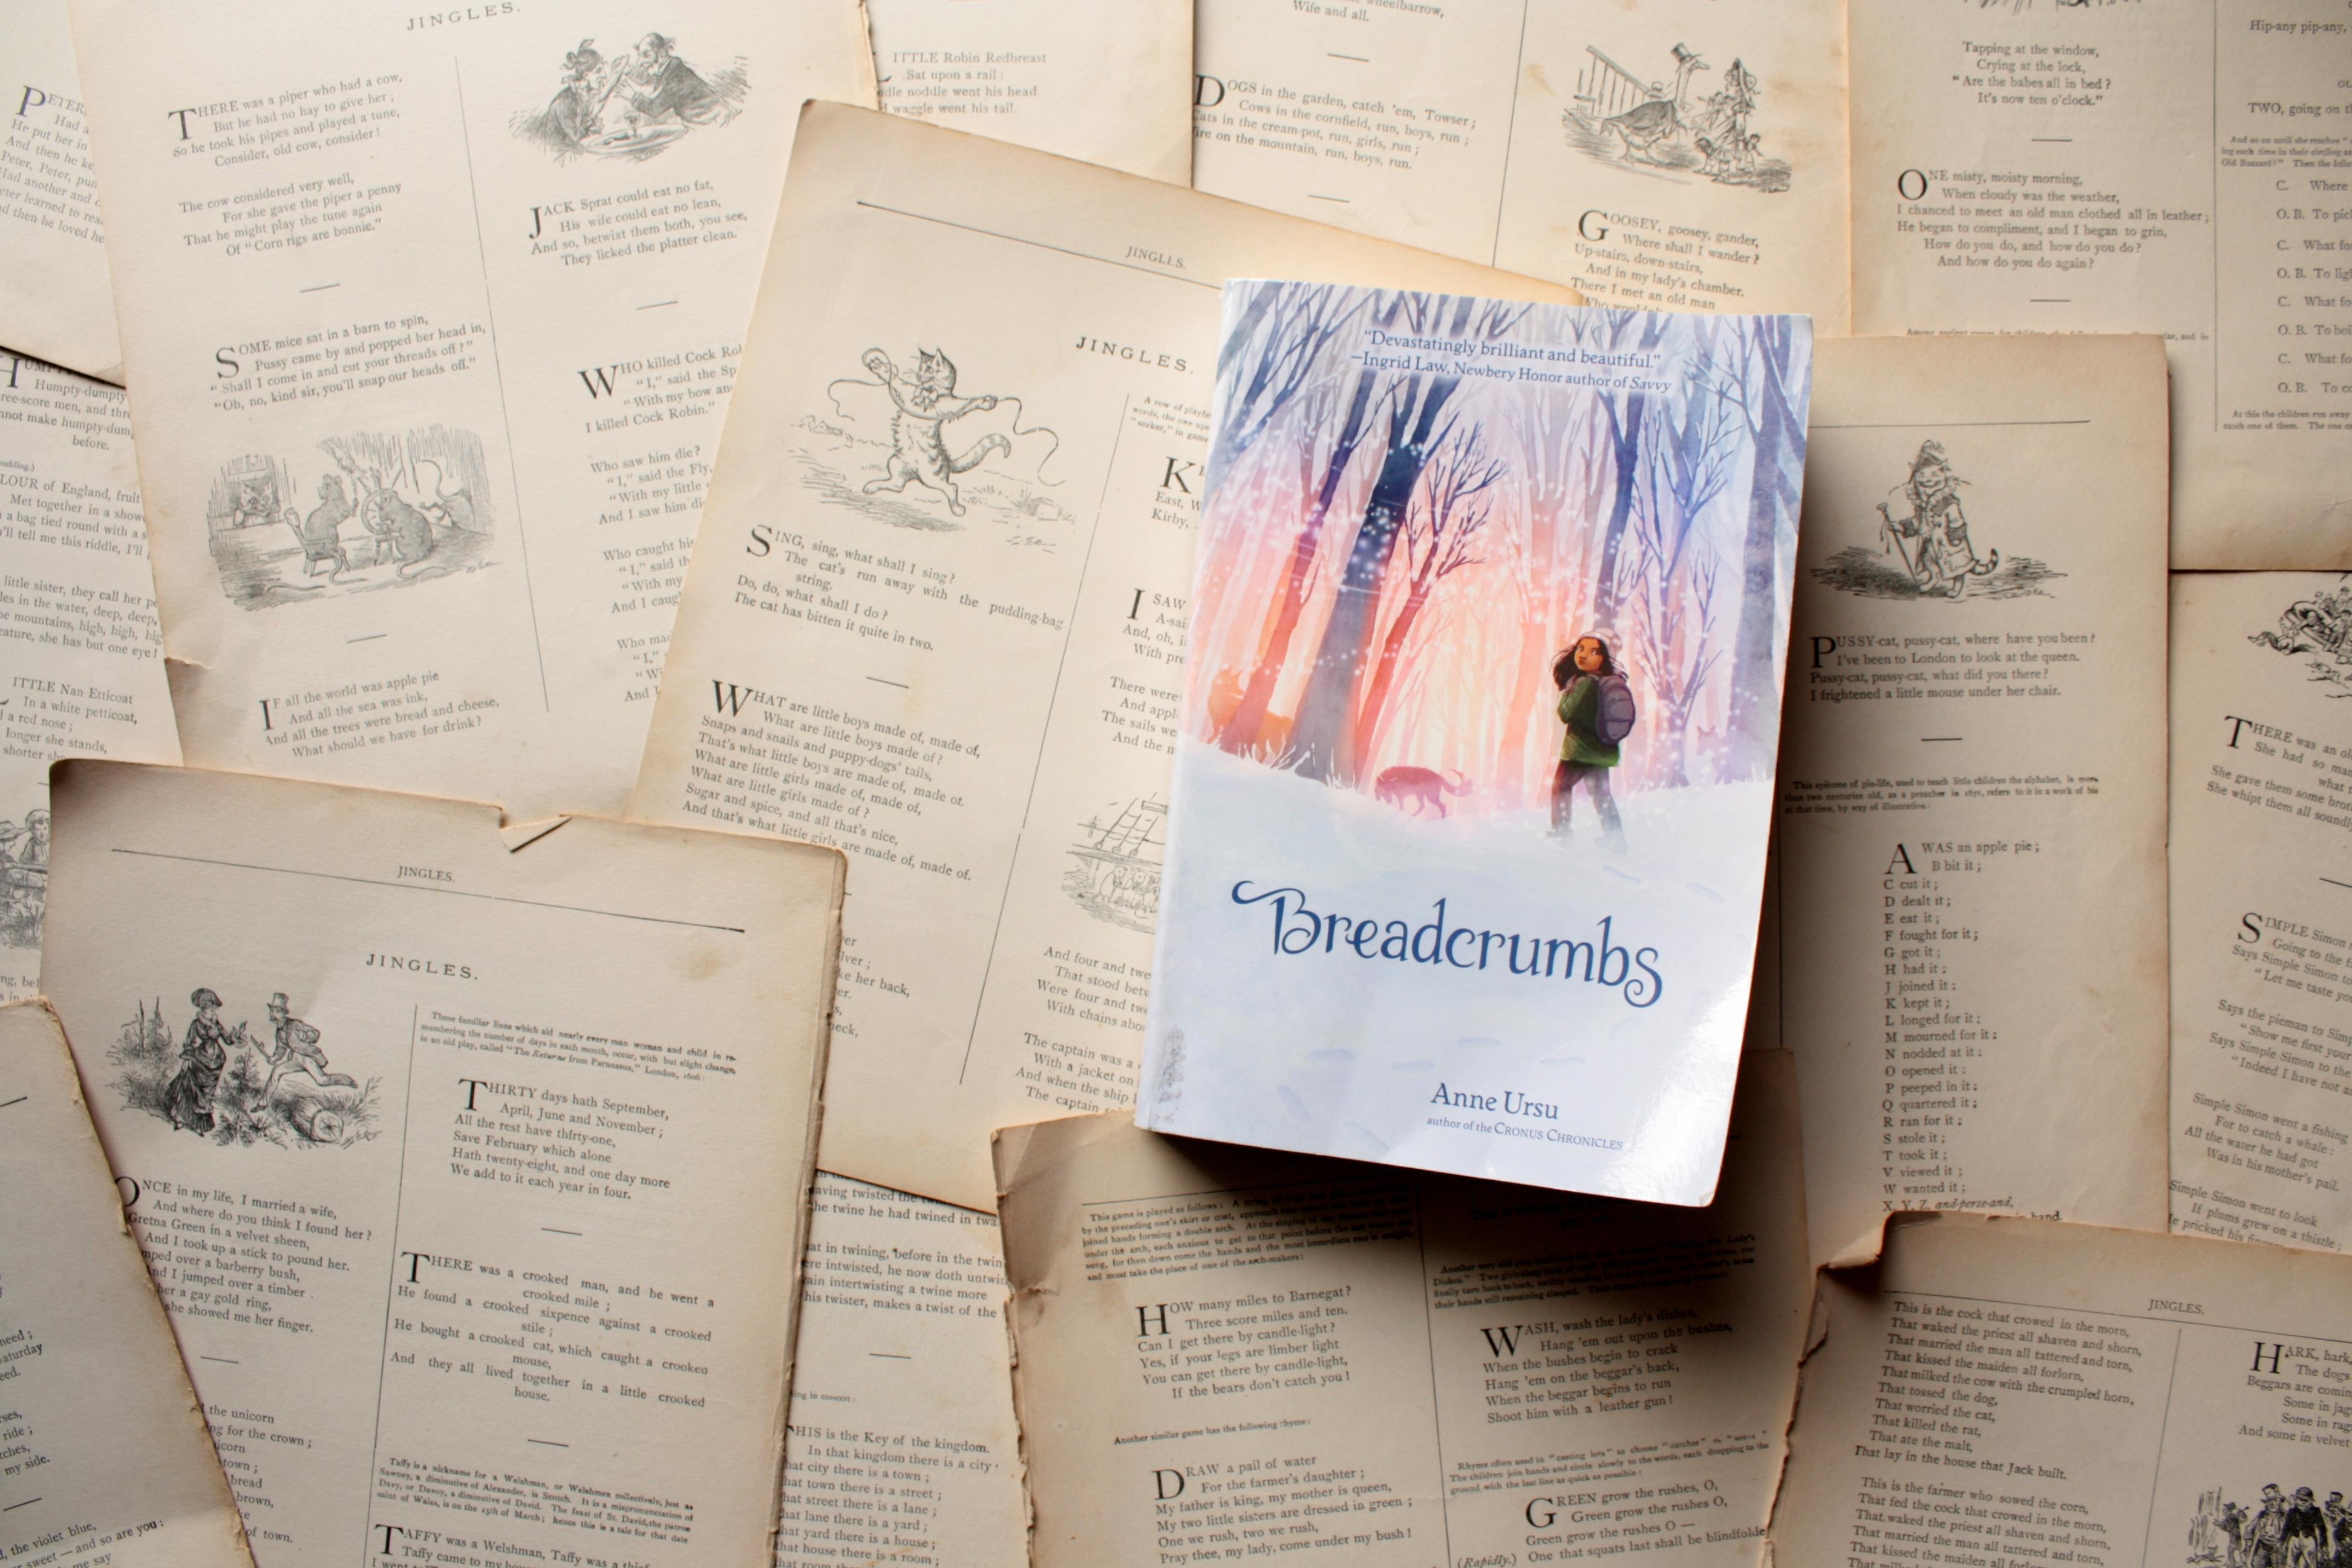 Breadcrumbs | Anne Ursu